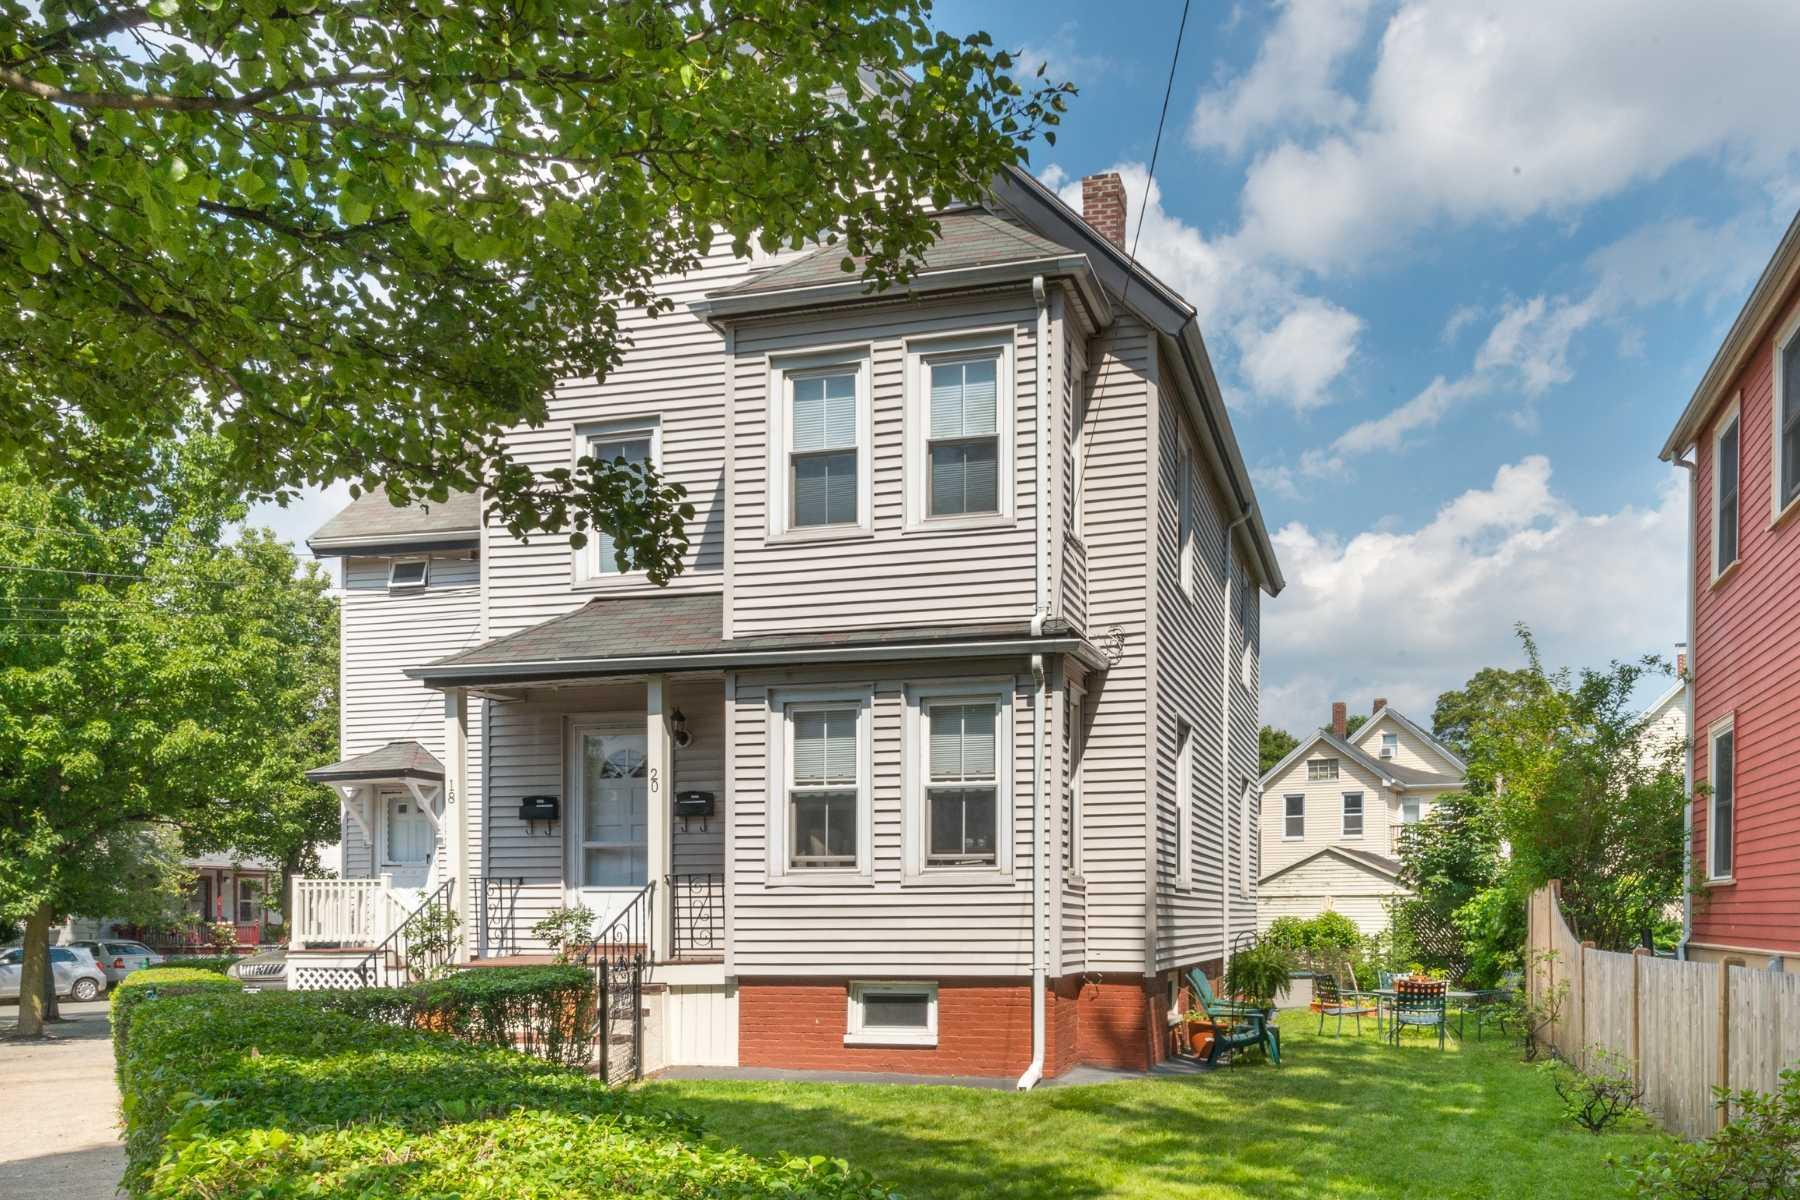 2-CapstoneCommunities-property-Dickinson-Street-Apartments-Somerville.jpg